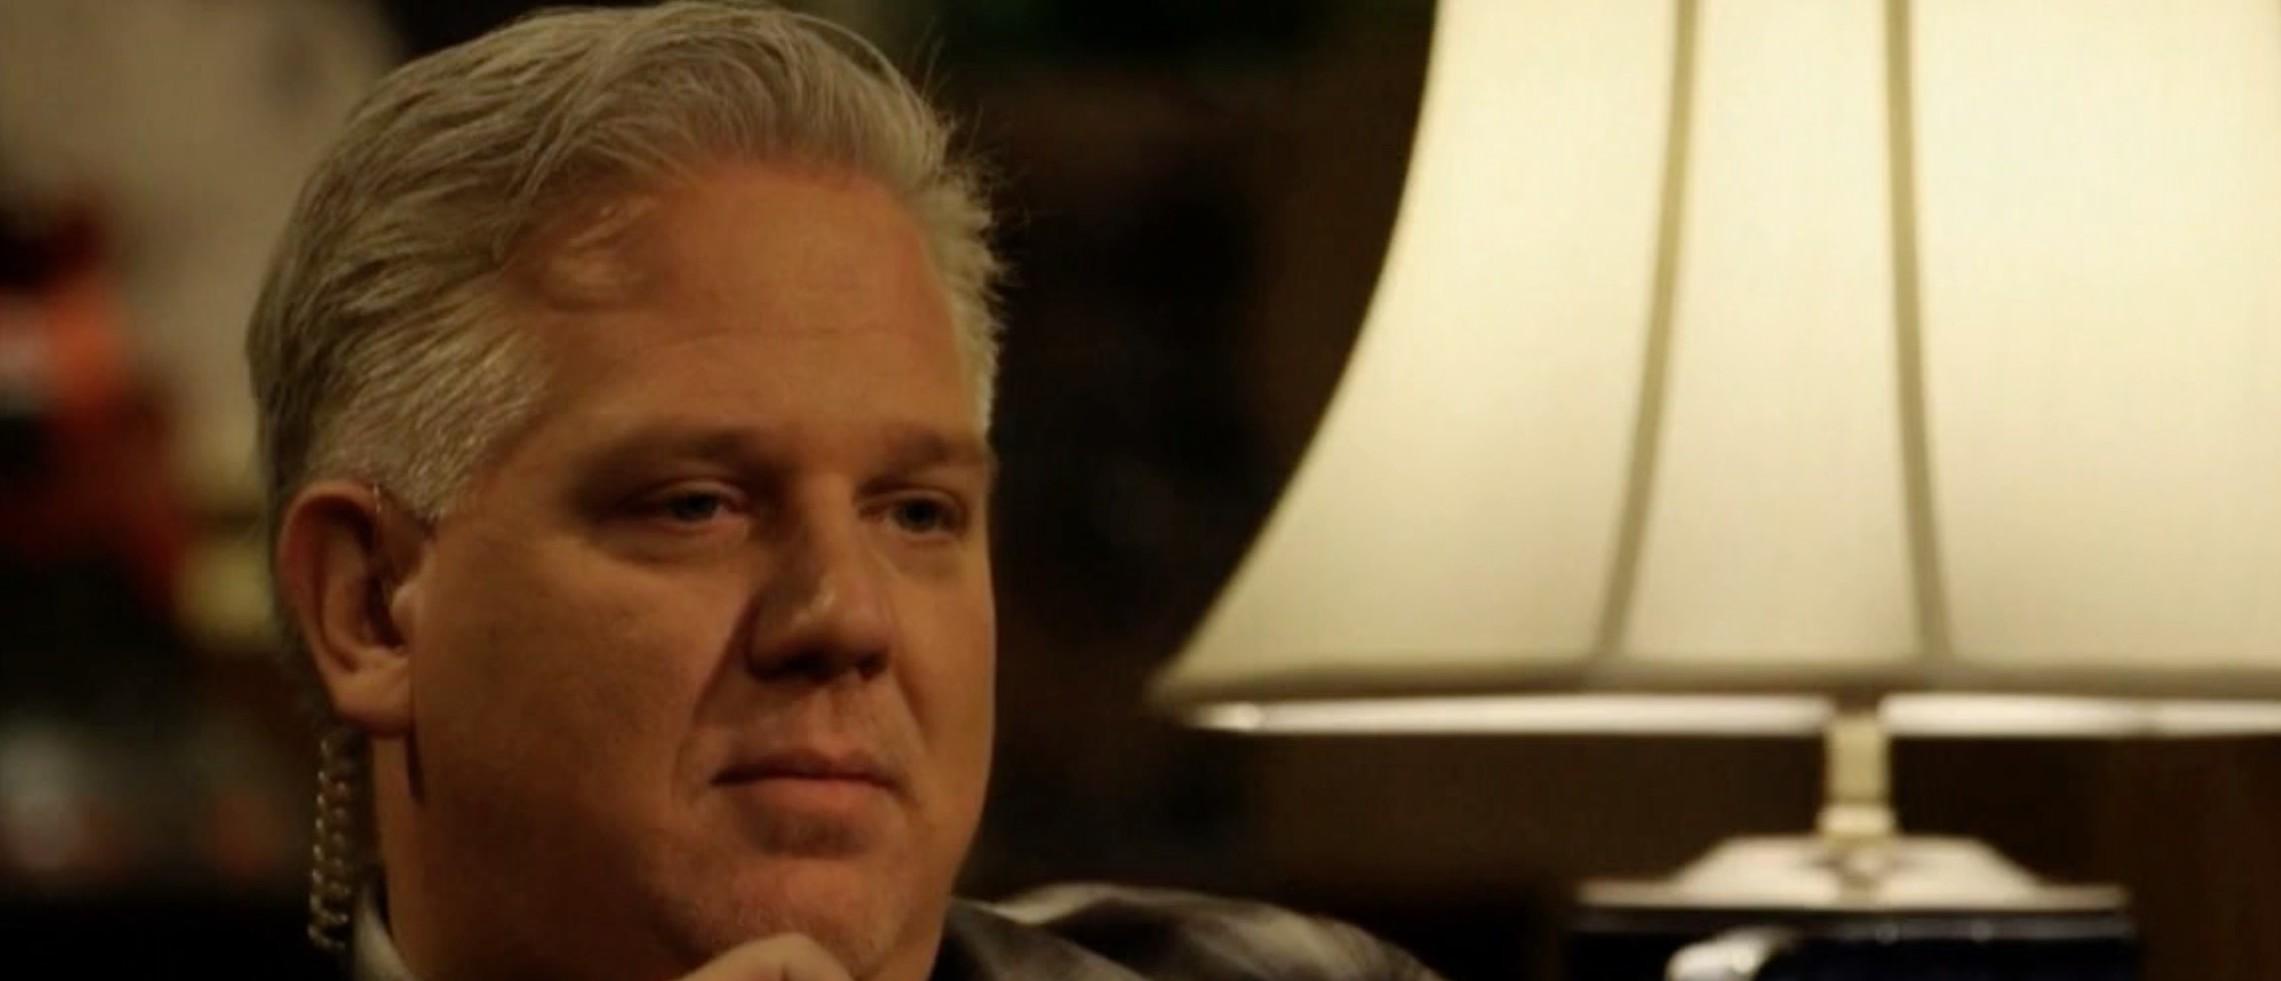 Glenn Beck's Media Empire Implodes With Layoffs, Ex-Employee